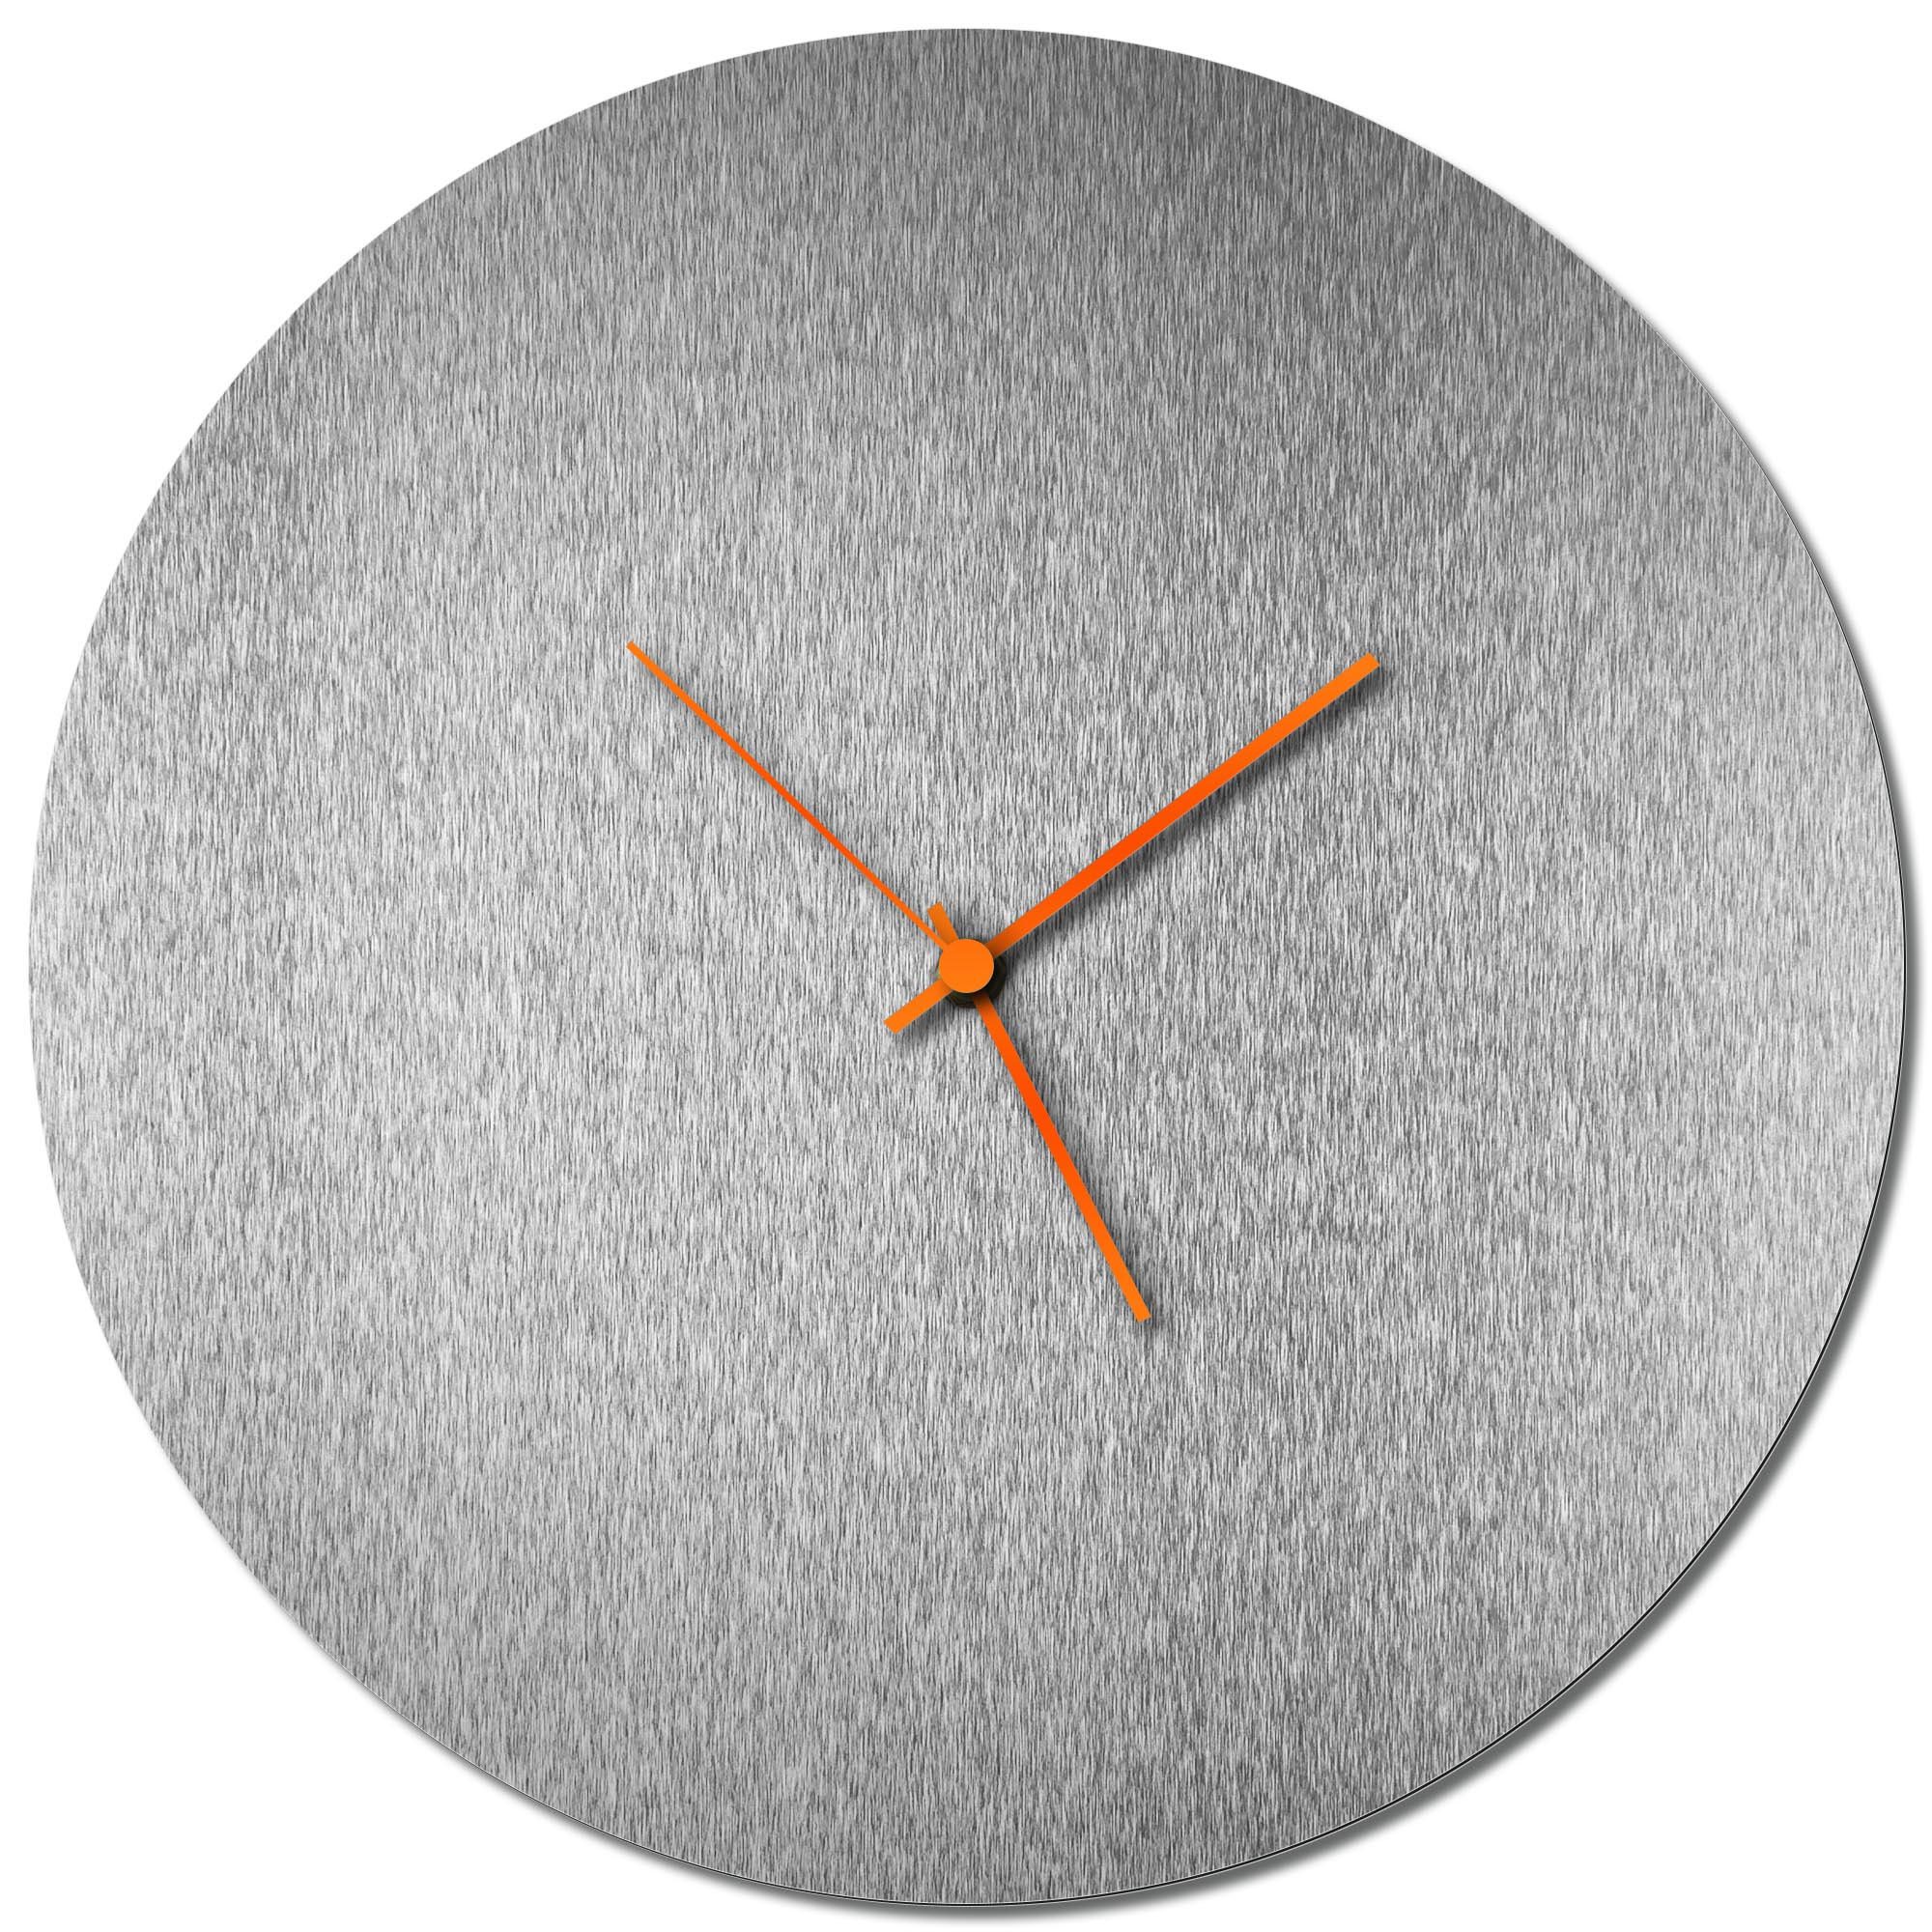 Adam Schwoeppe 'Silversmith Circle Clock Large Orange' Midcentury Modern Style Wall Clock